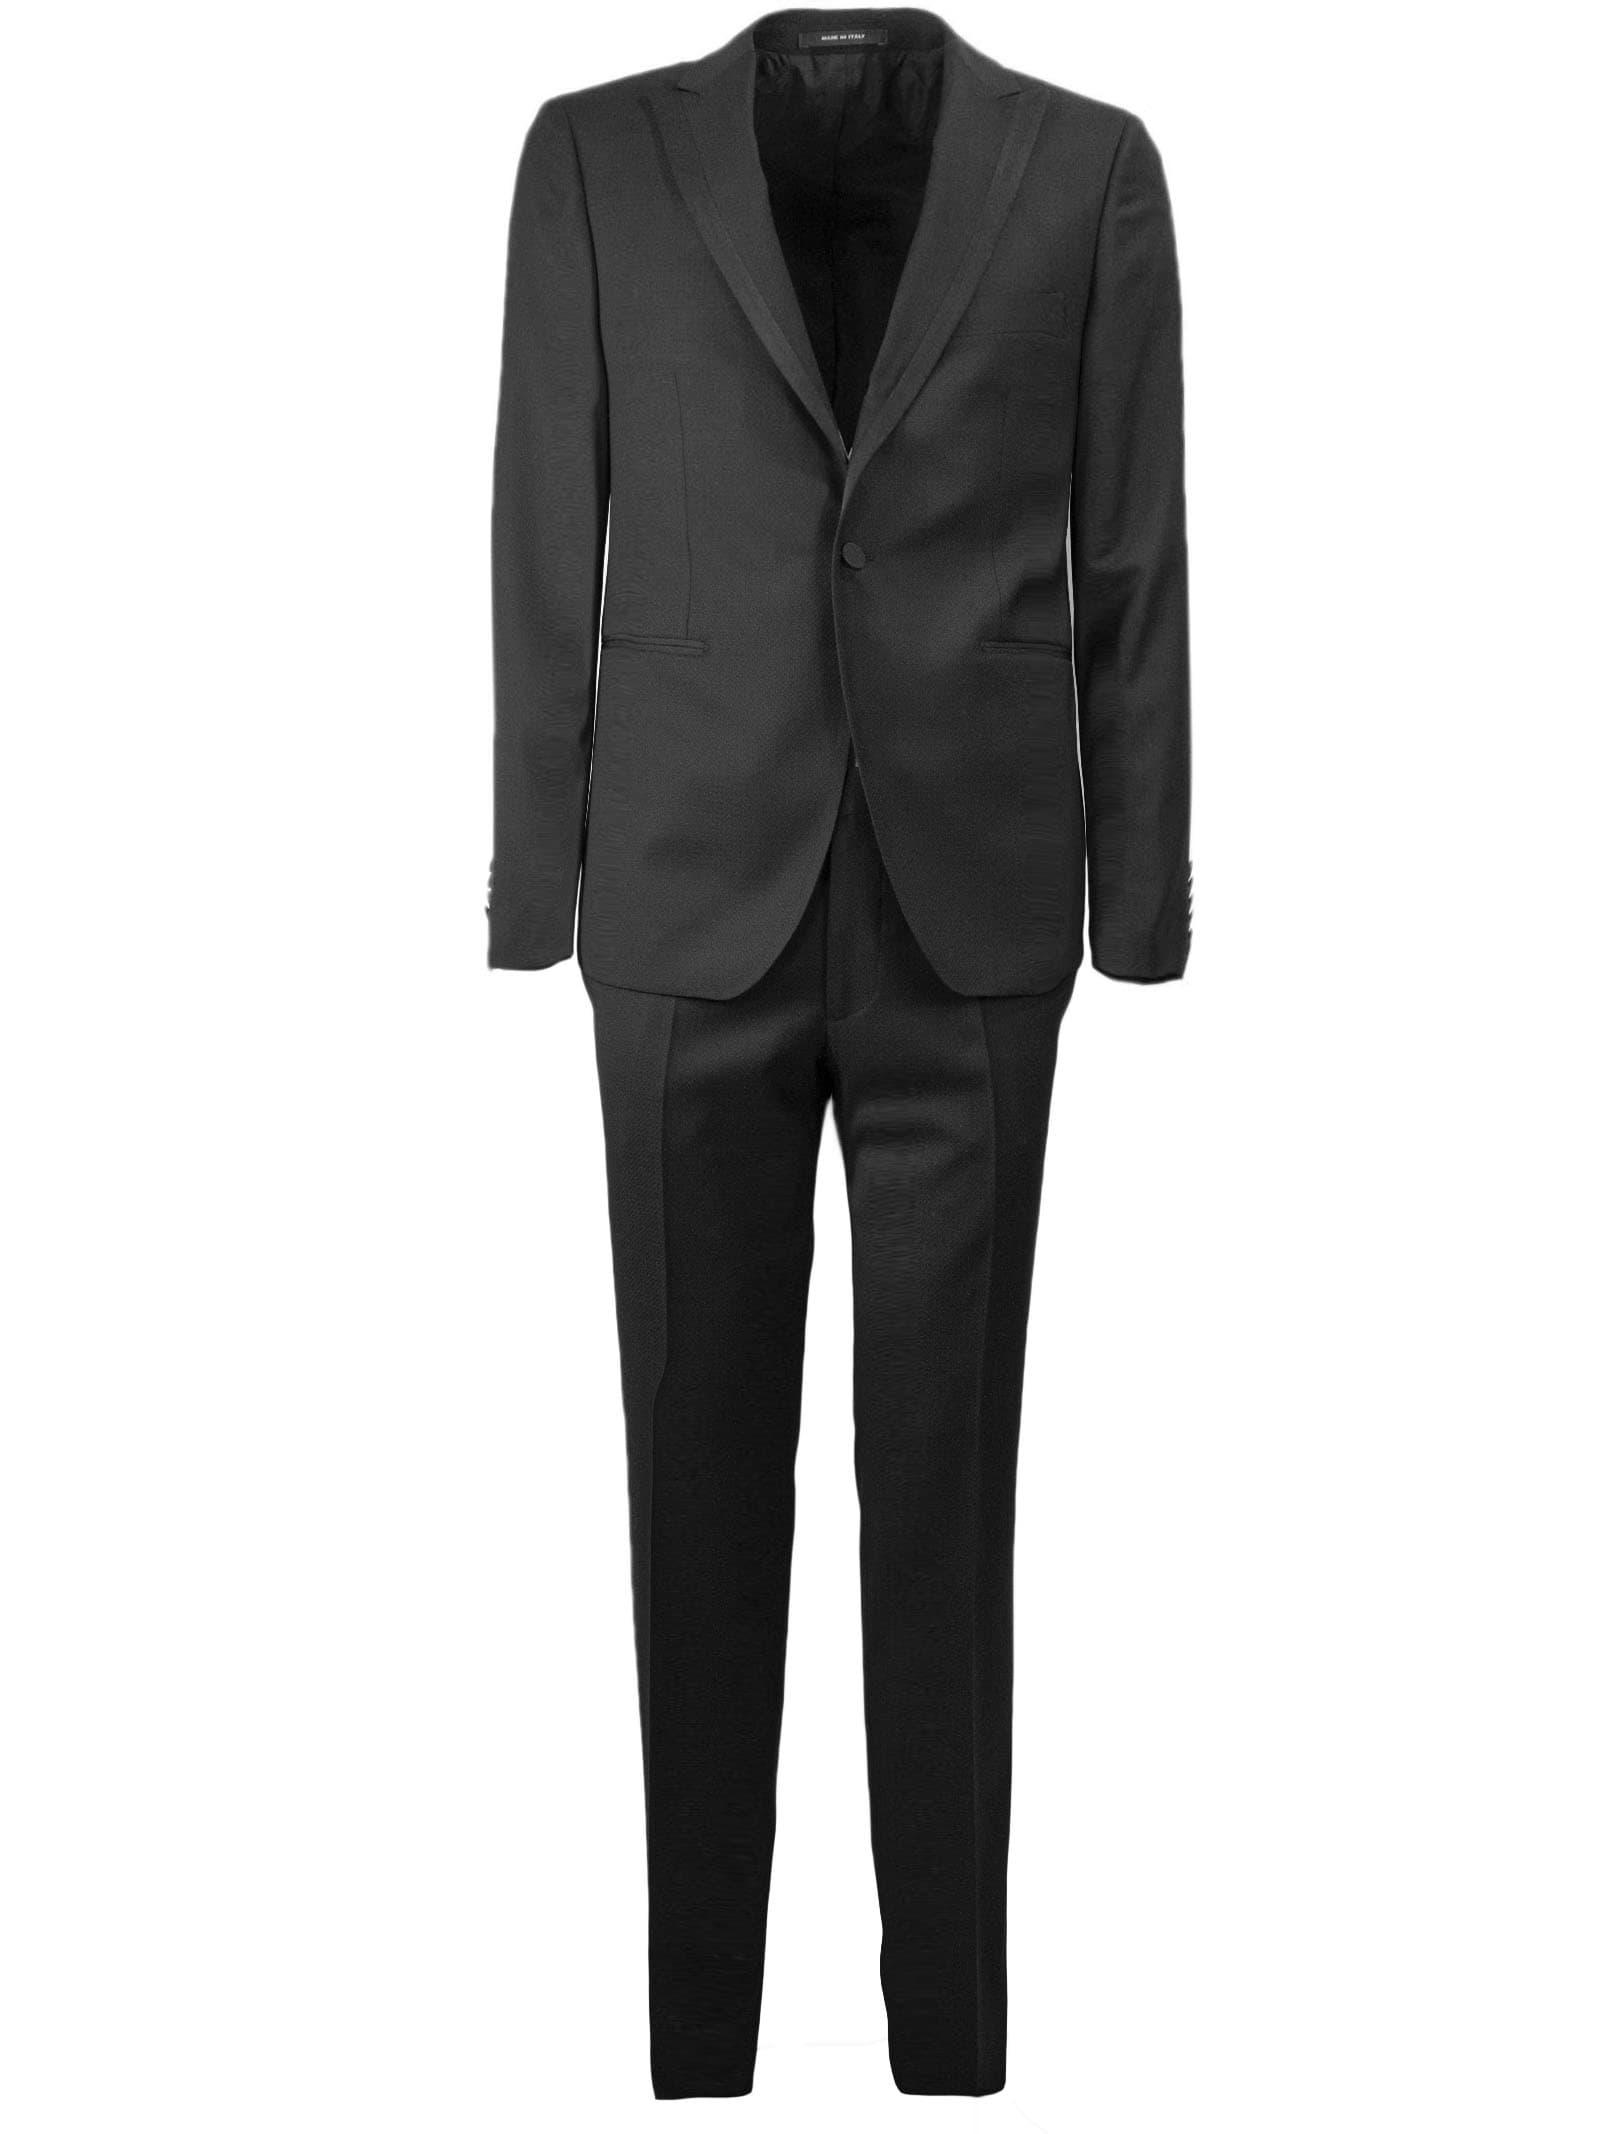 Tagliatore Black Virgin Wool Two-piece Suit